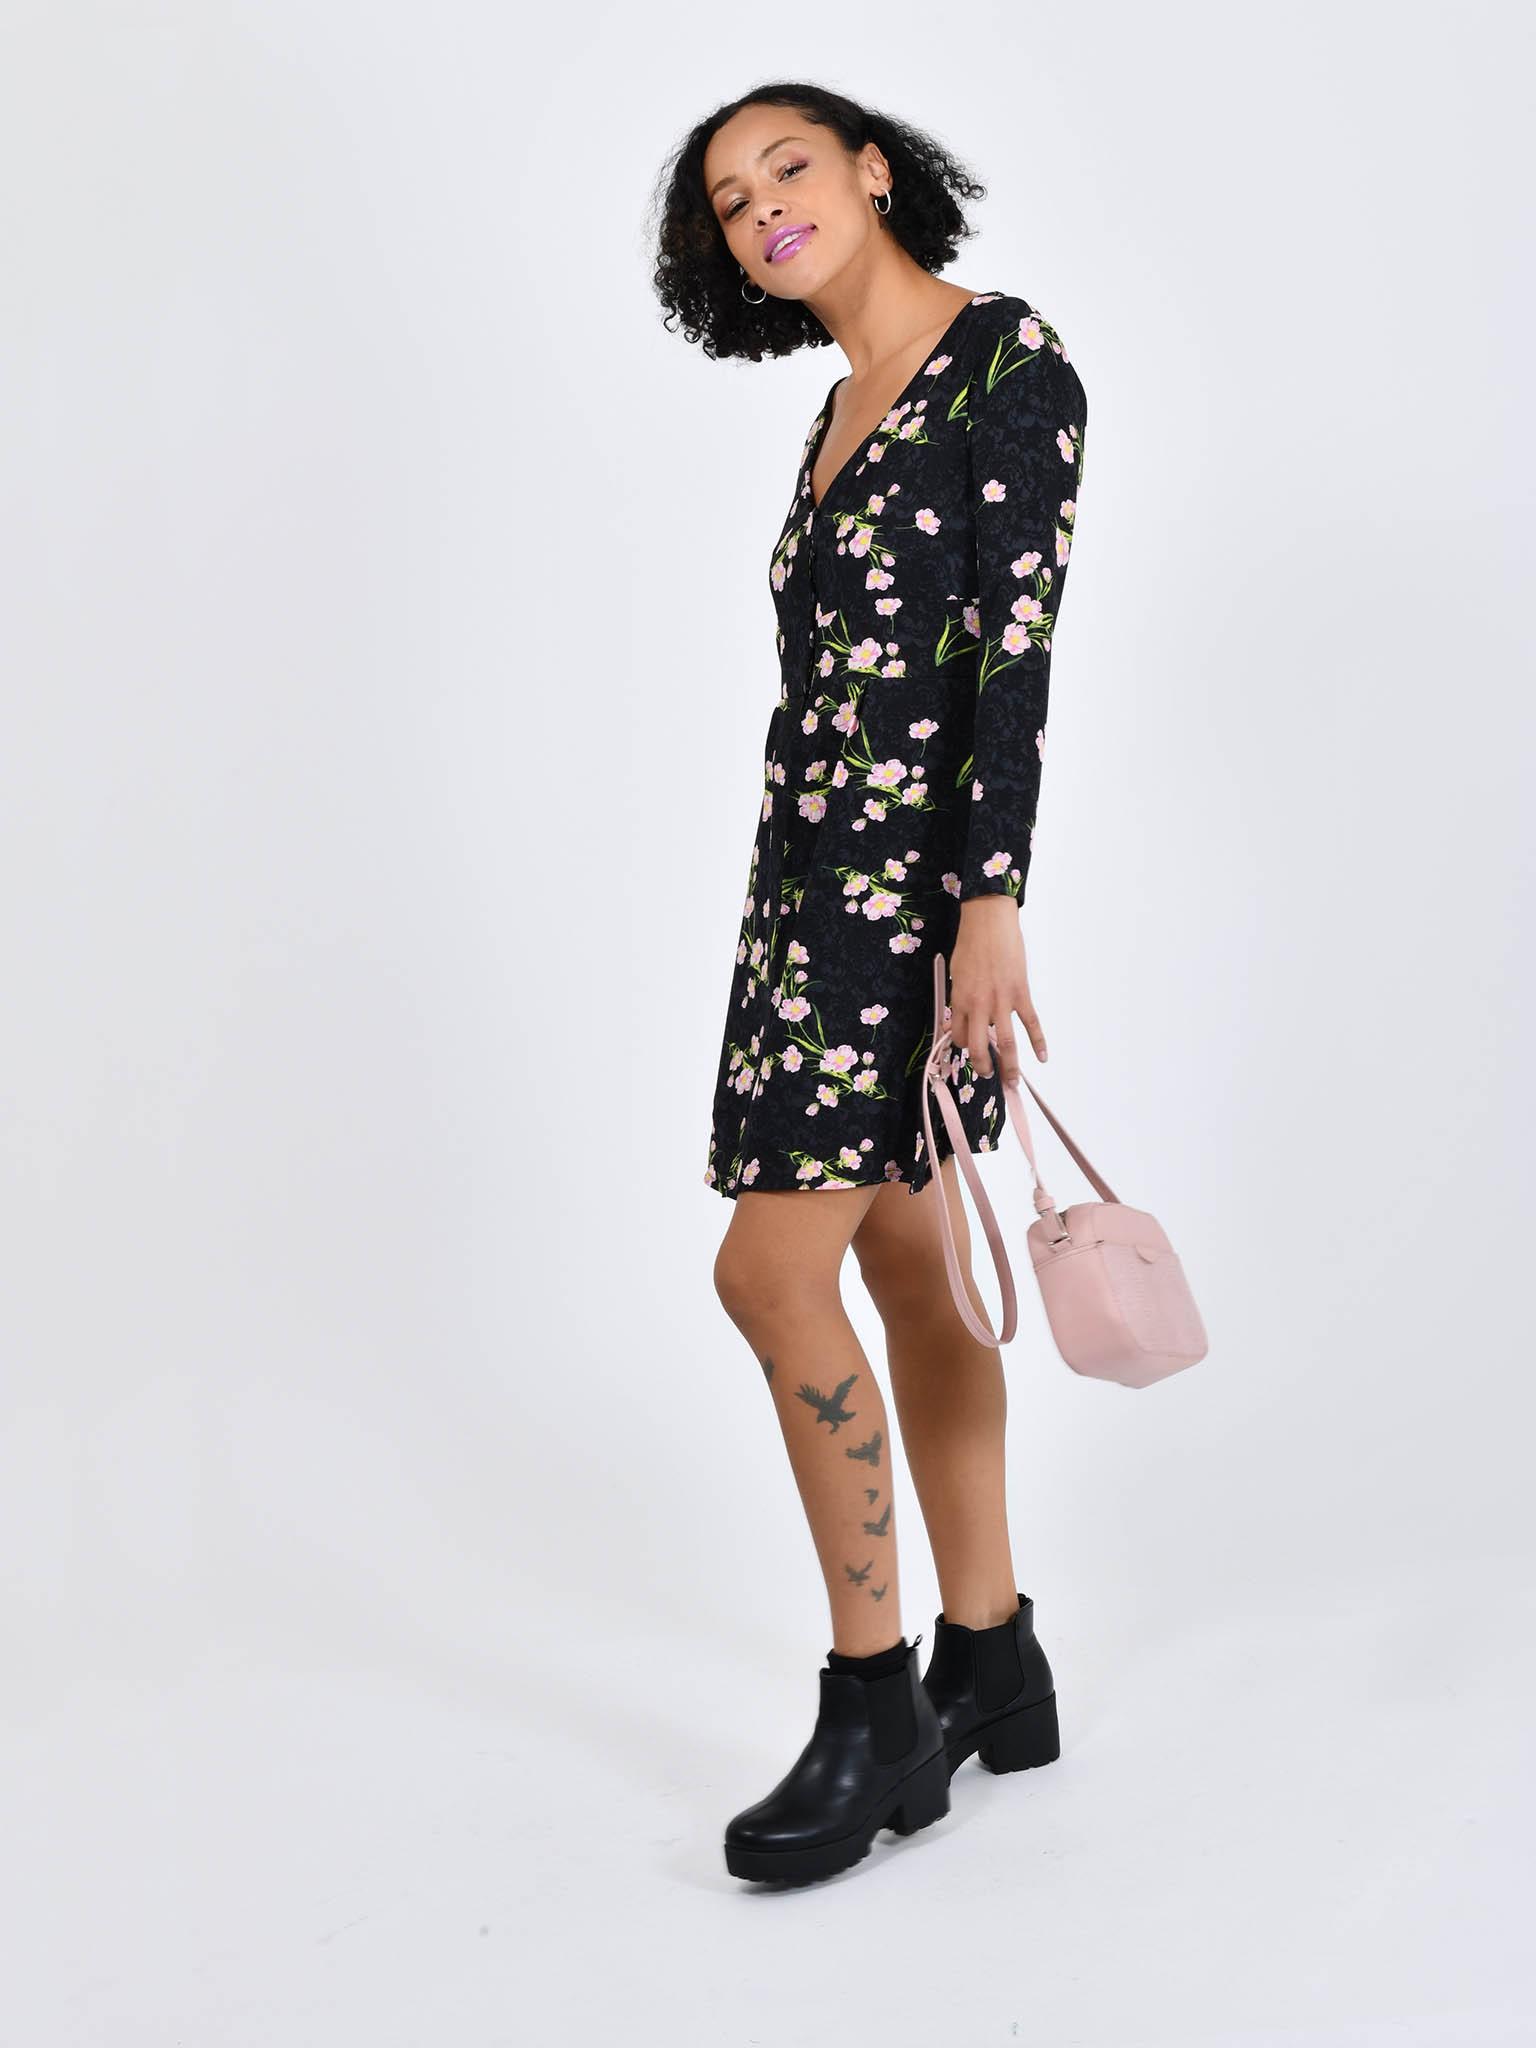 Oferta de Vestido Flores por $153.3